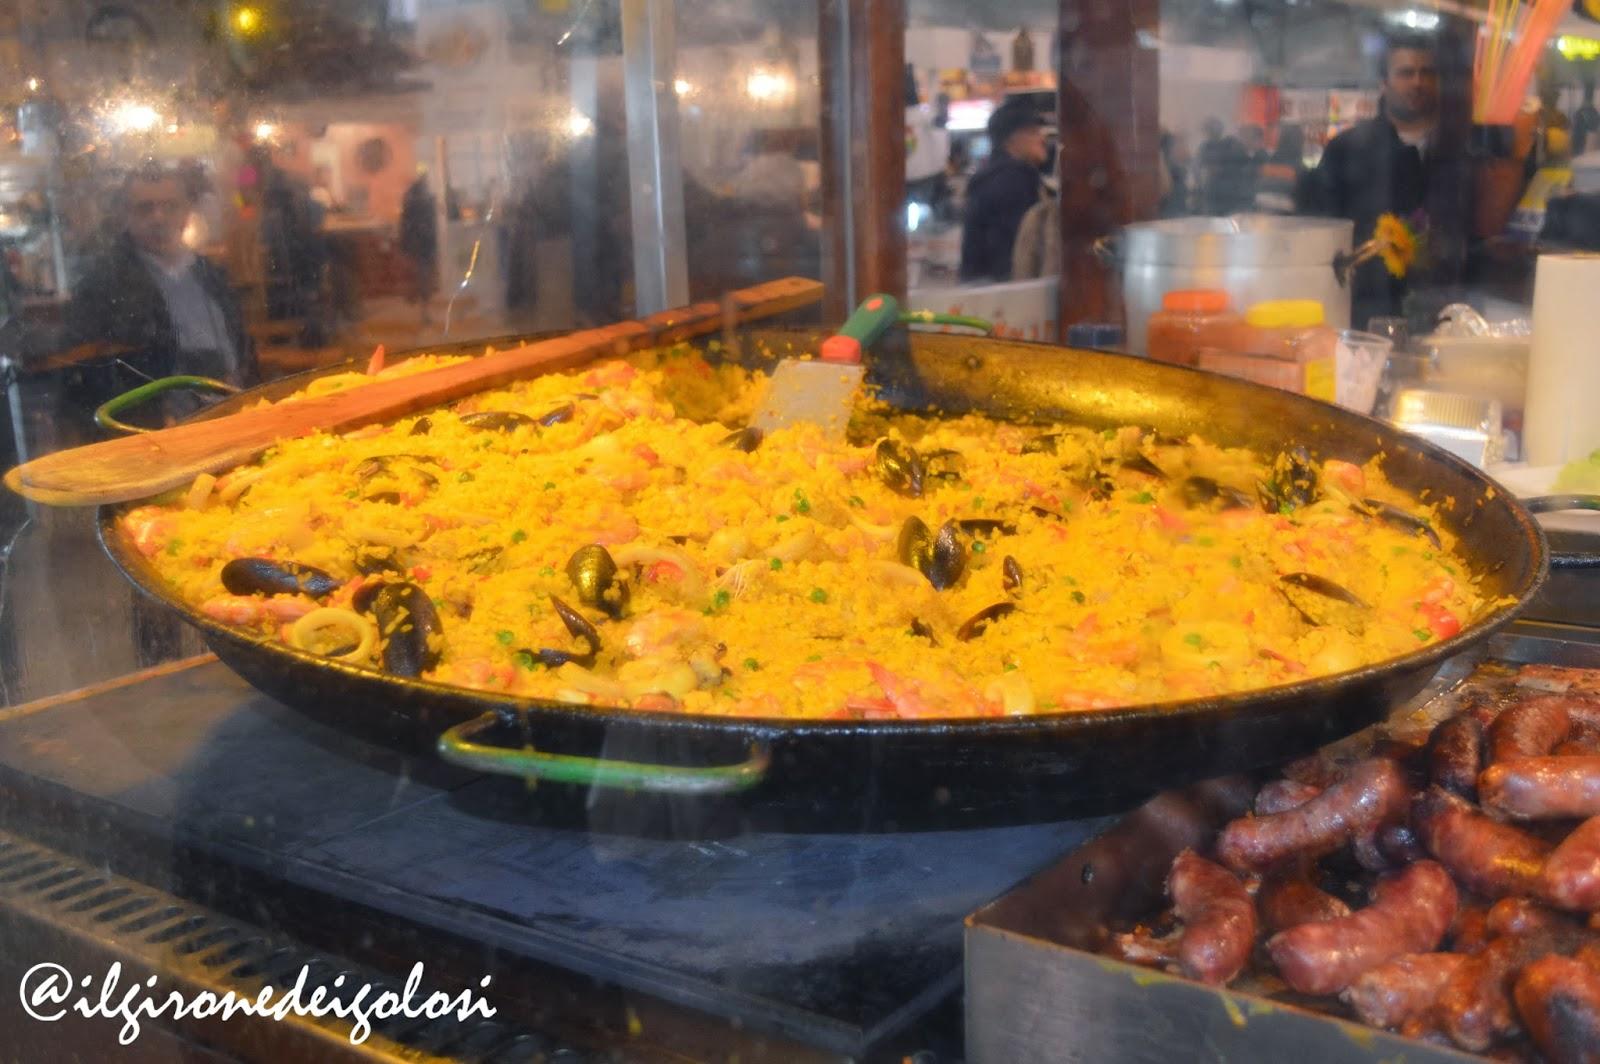 GolosItalia 2014 & Pasticceria Di Iginio Massari Il Cucchiaio Verde #C78D04 1600 1064 Cucina Etnica A Brescia